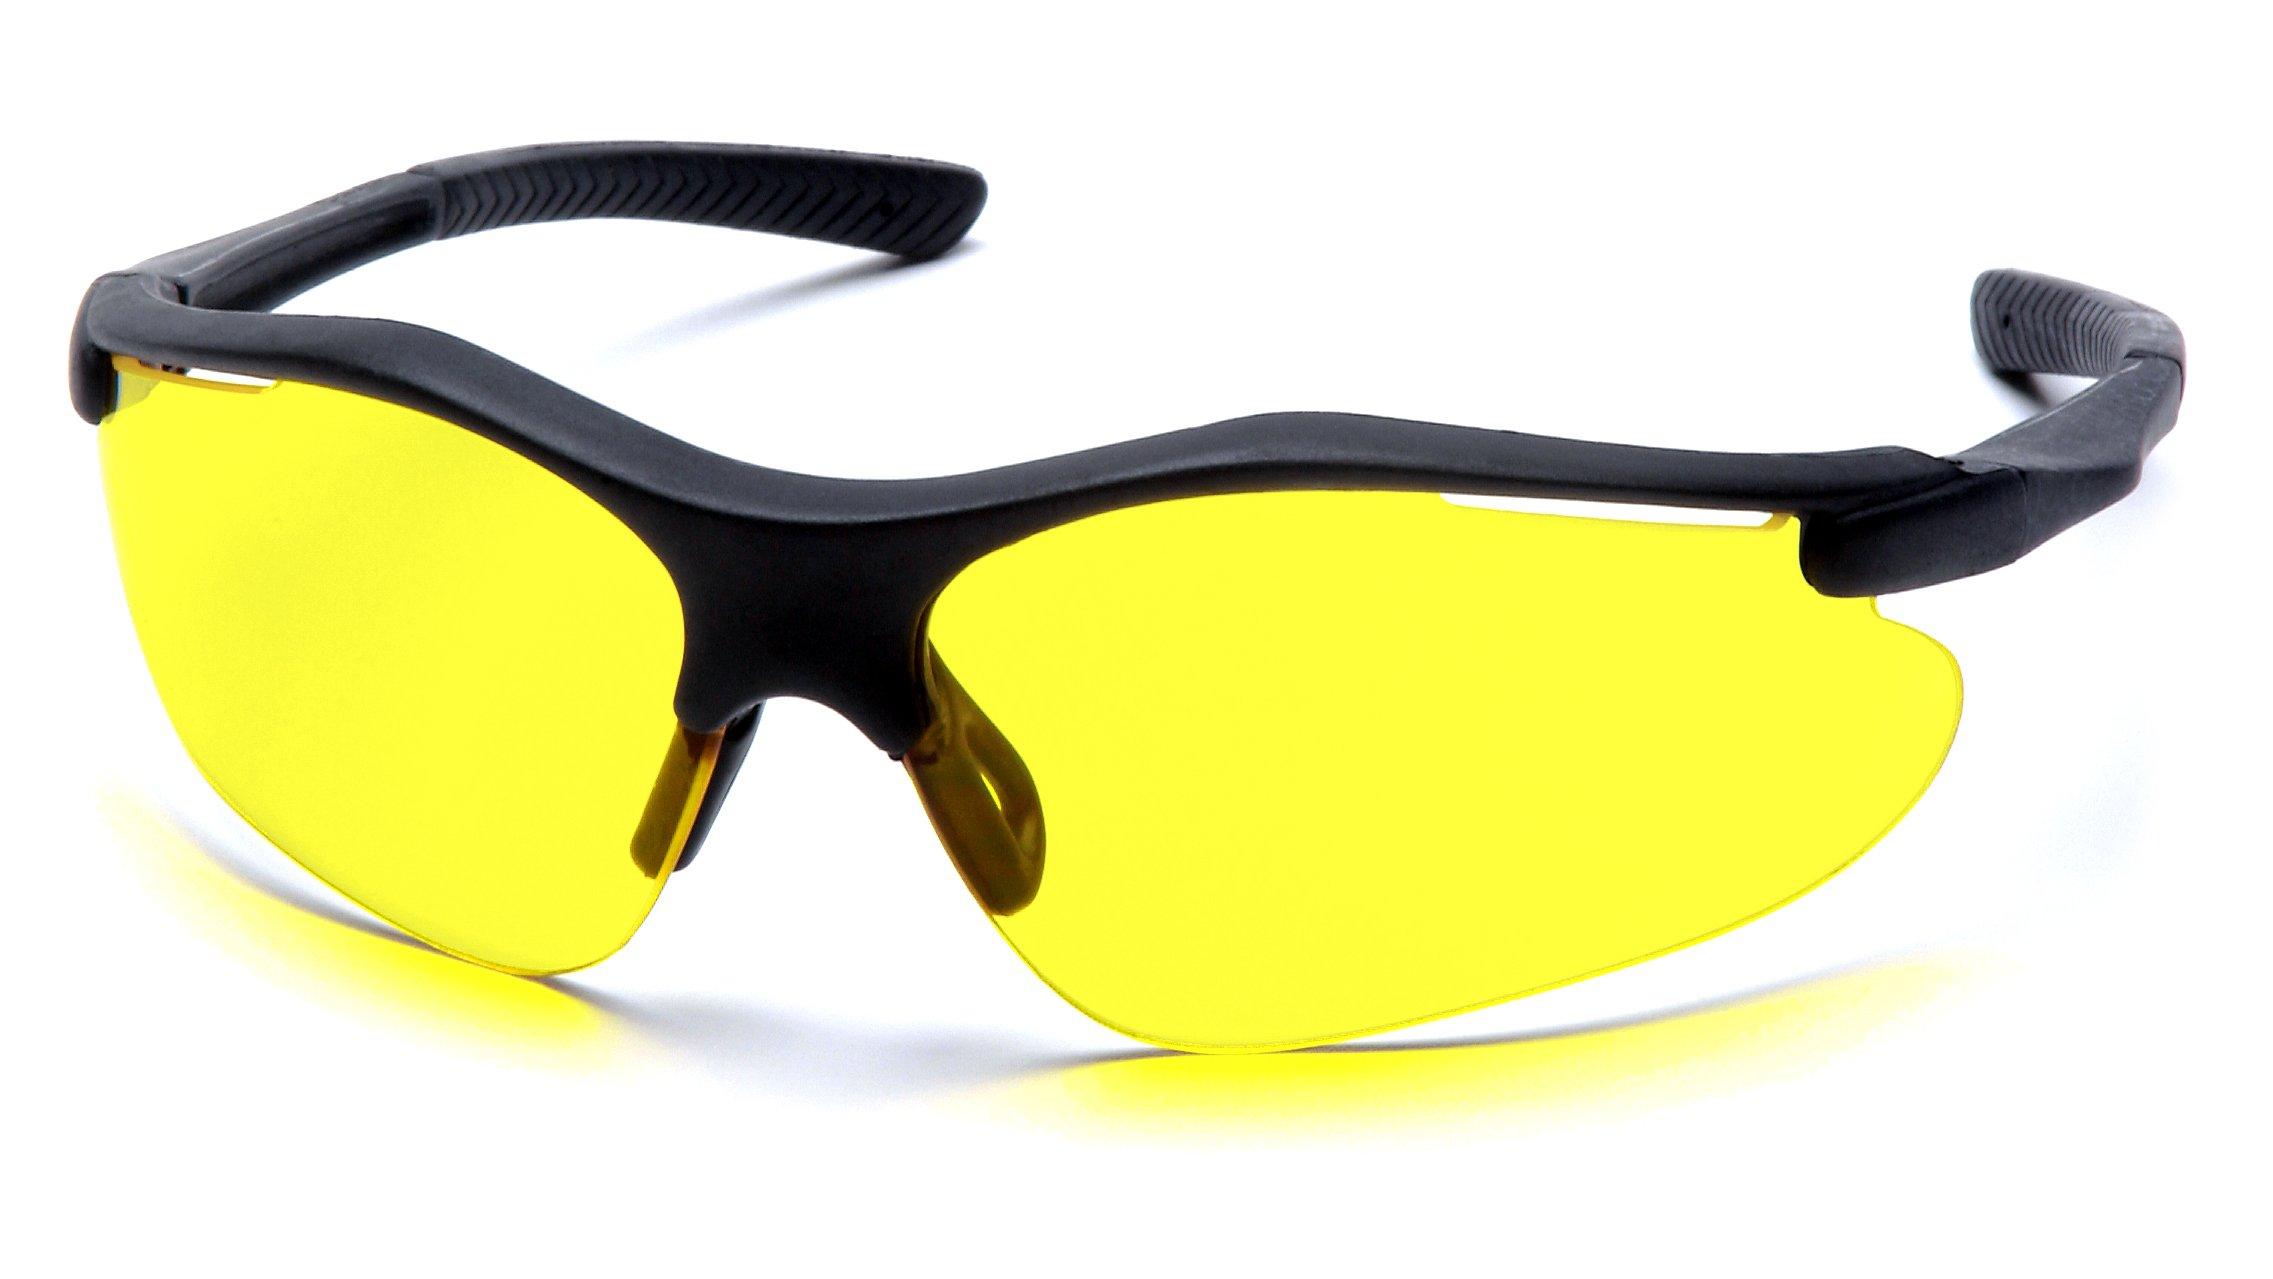 Pyramex Fortress Safety Eyewear, Amber Lens With Black Frame